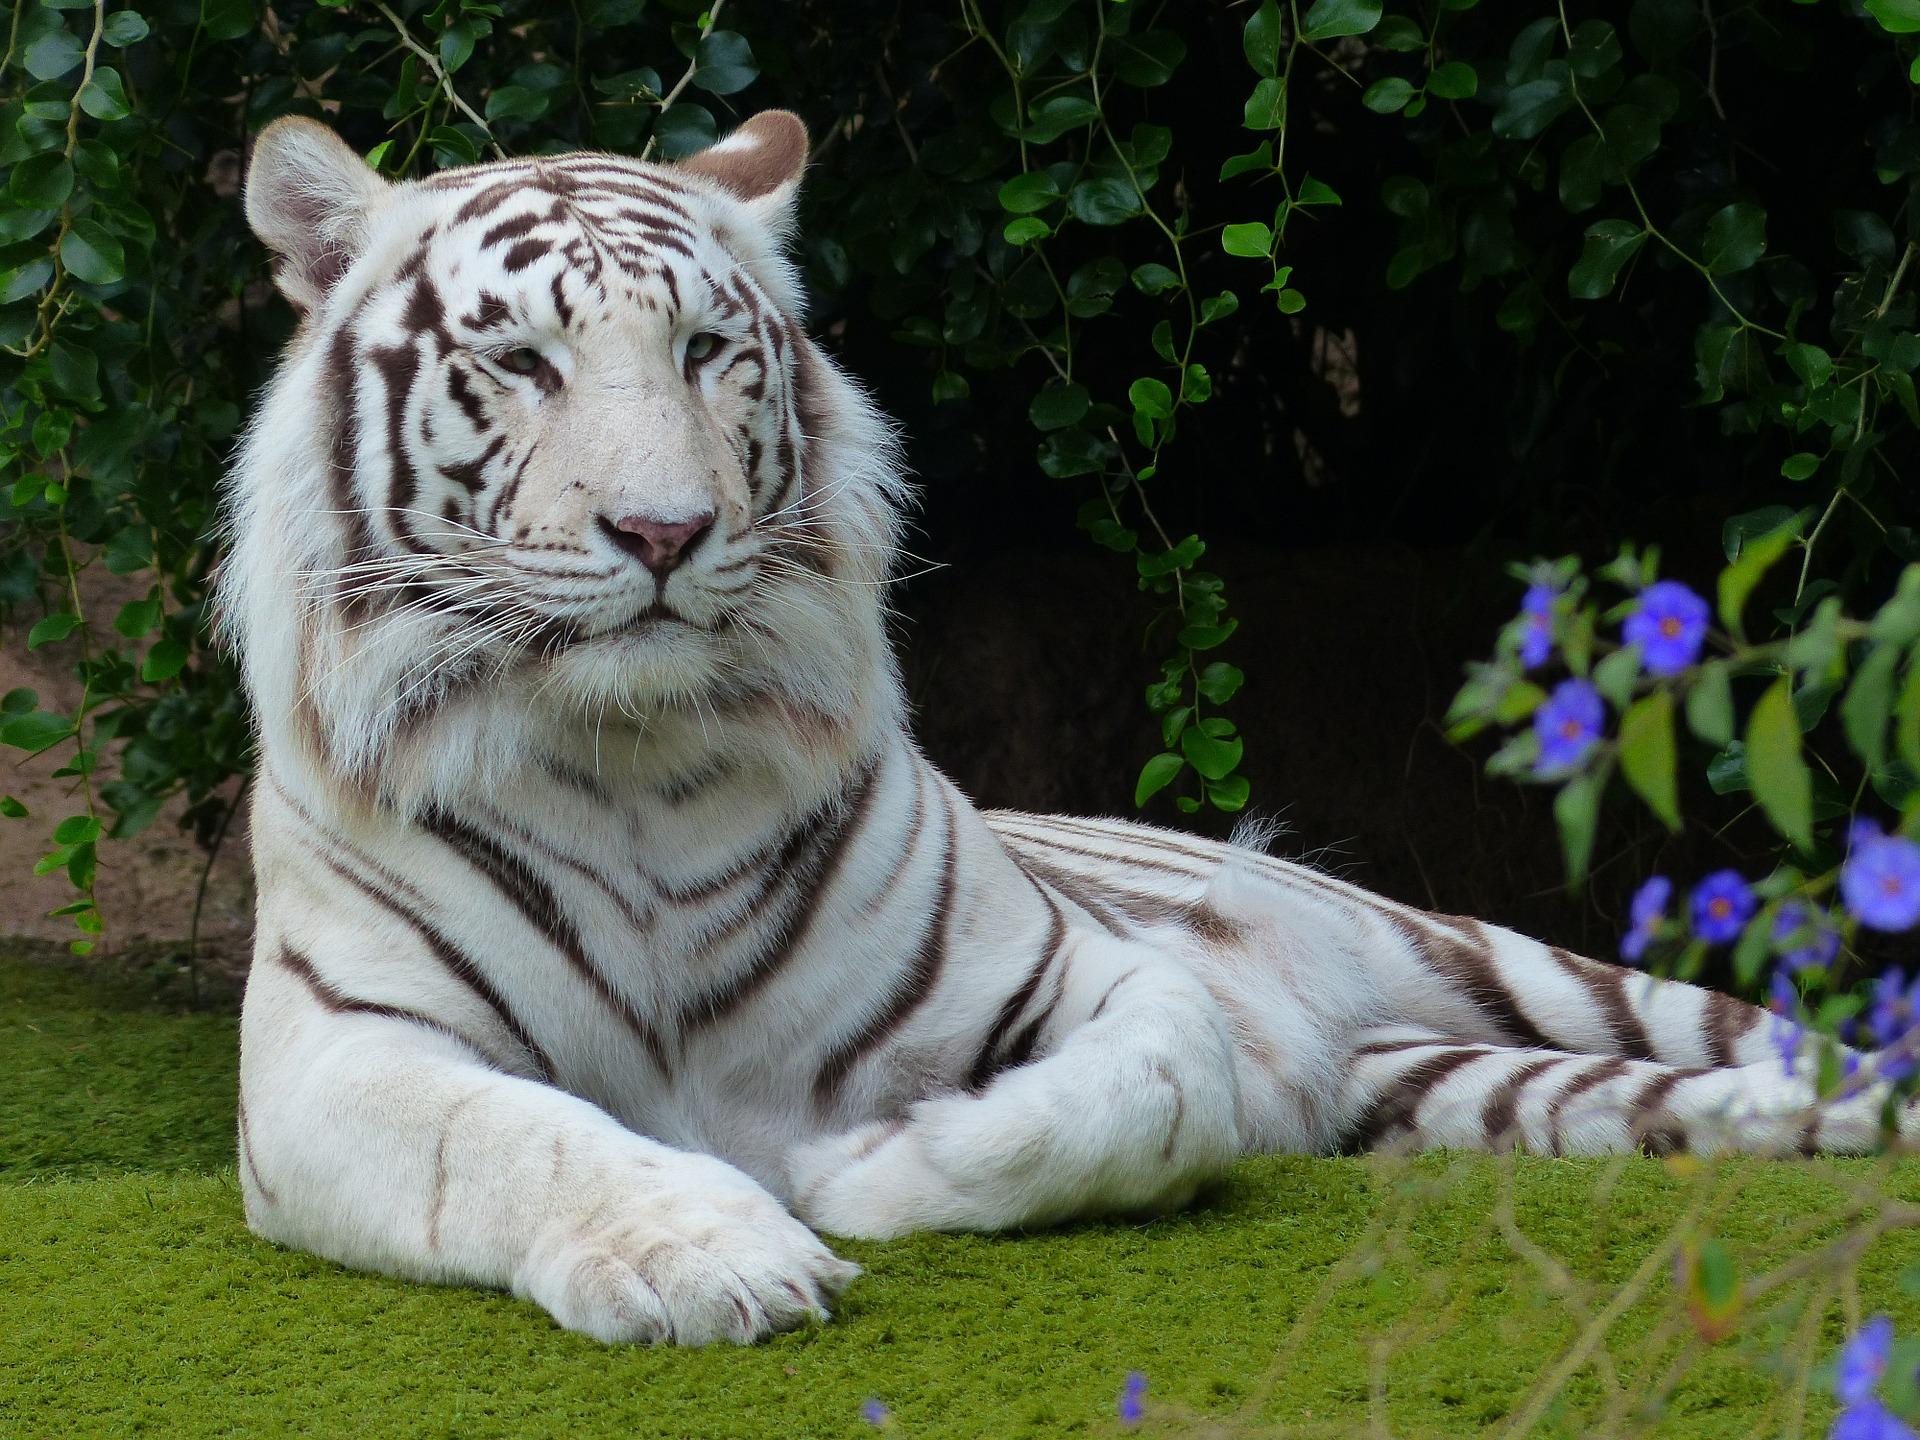 Tigre blanco con rayas negras